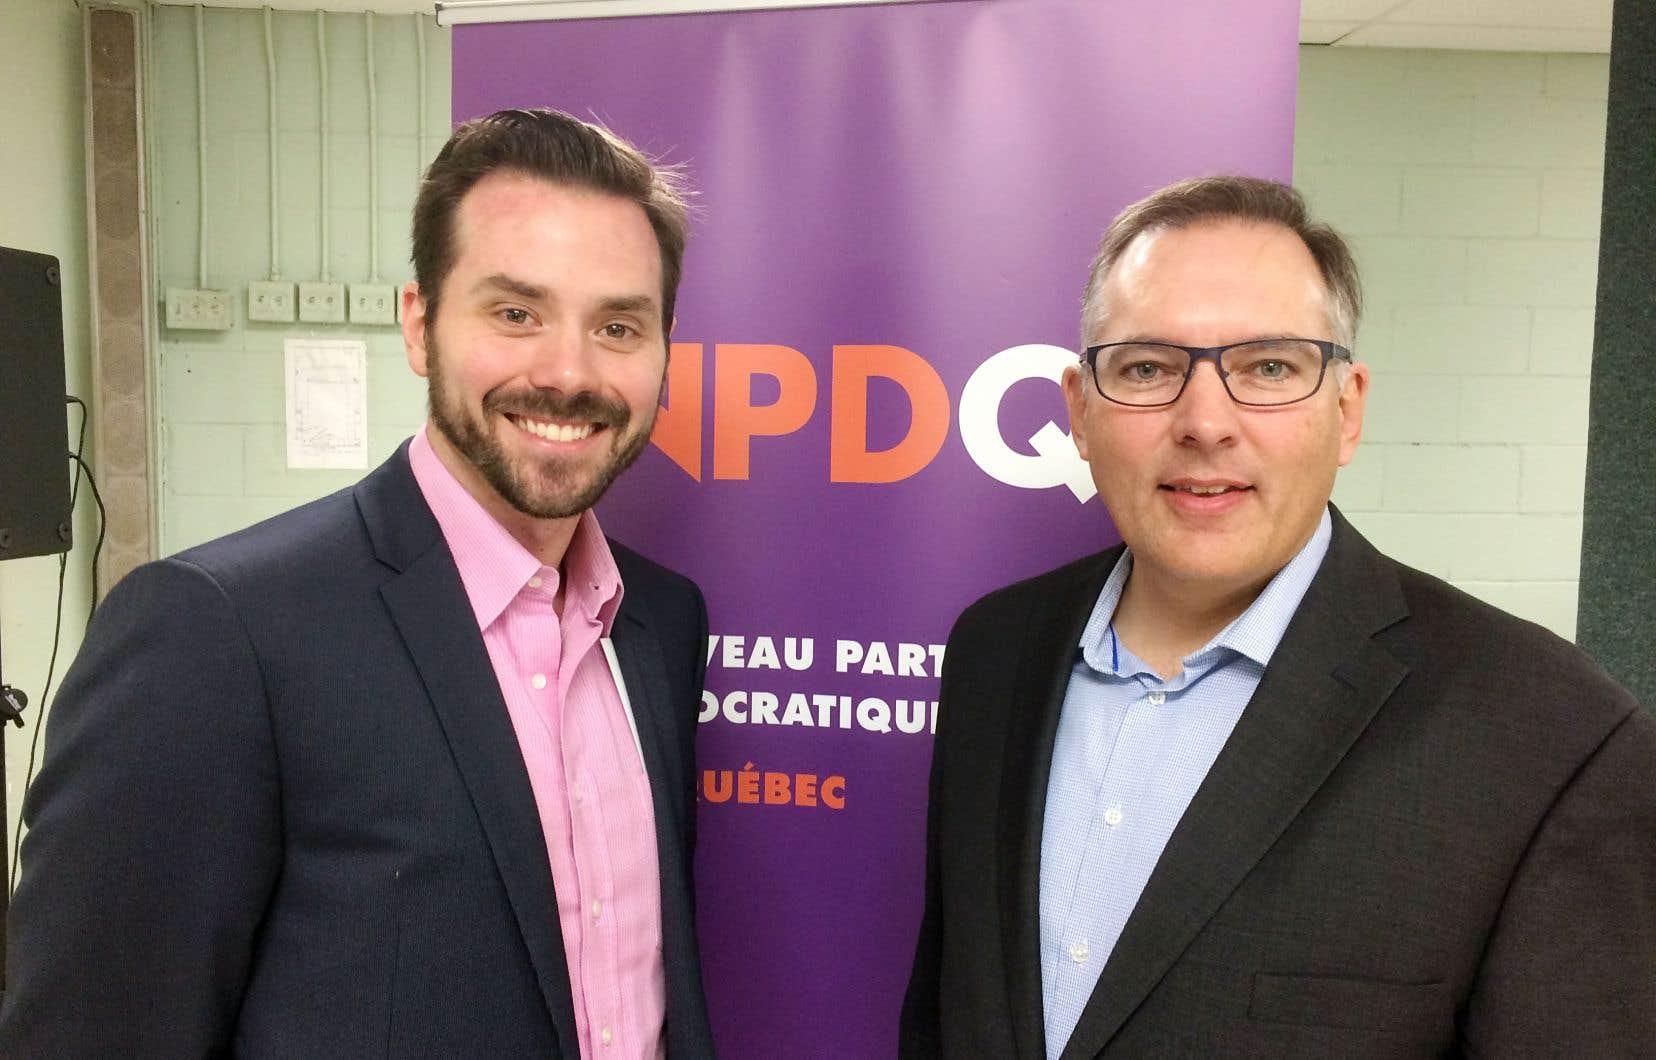 Les aspirants chefs Raphaël Fortin, 37 ans, et Raymond Côté, 50 ans